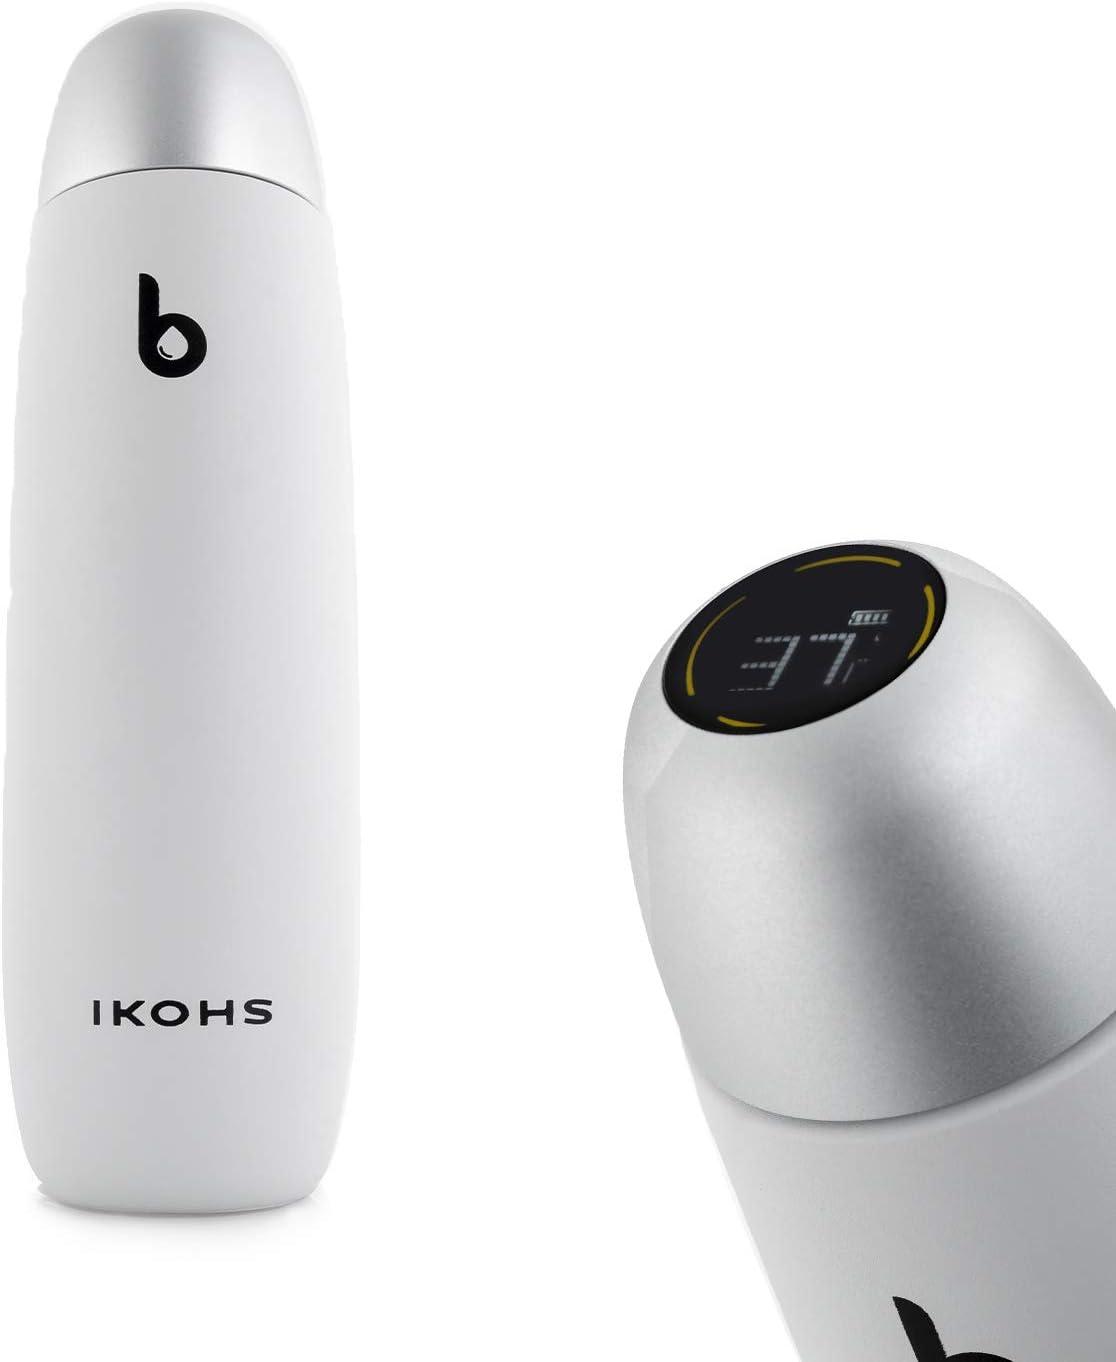 IKOHS B-Life Smart - Botella Termo Inteligente Portátil, Taza de Viaje, Térmica de Doble Capa de Acero Inoxidable, Pantalla Inteligente con Temperatura, Botella de Agua Sin BPA (Blanco)